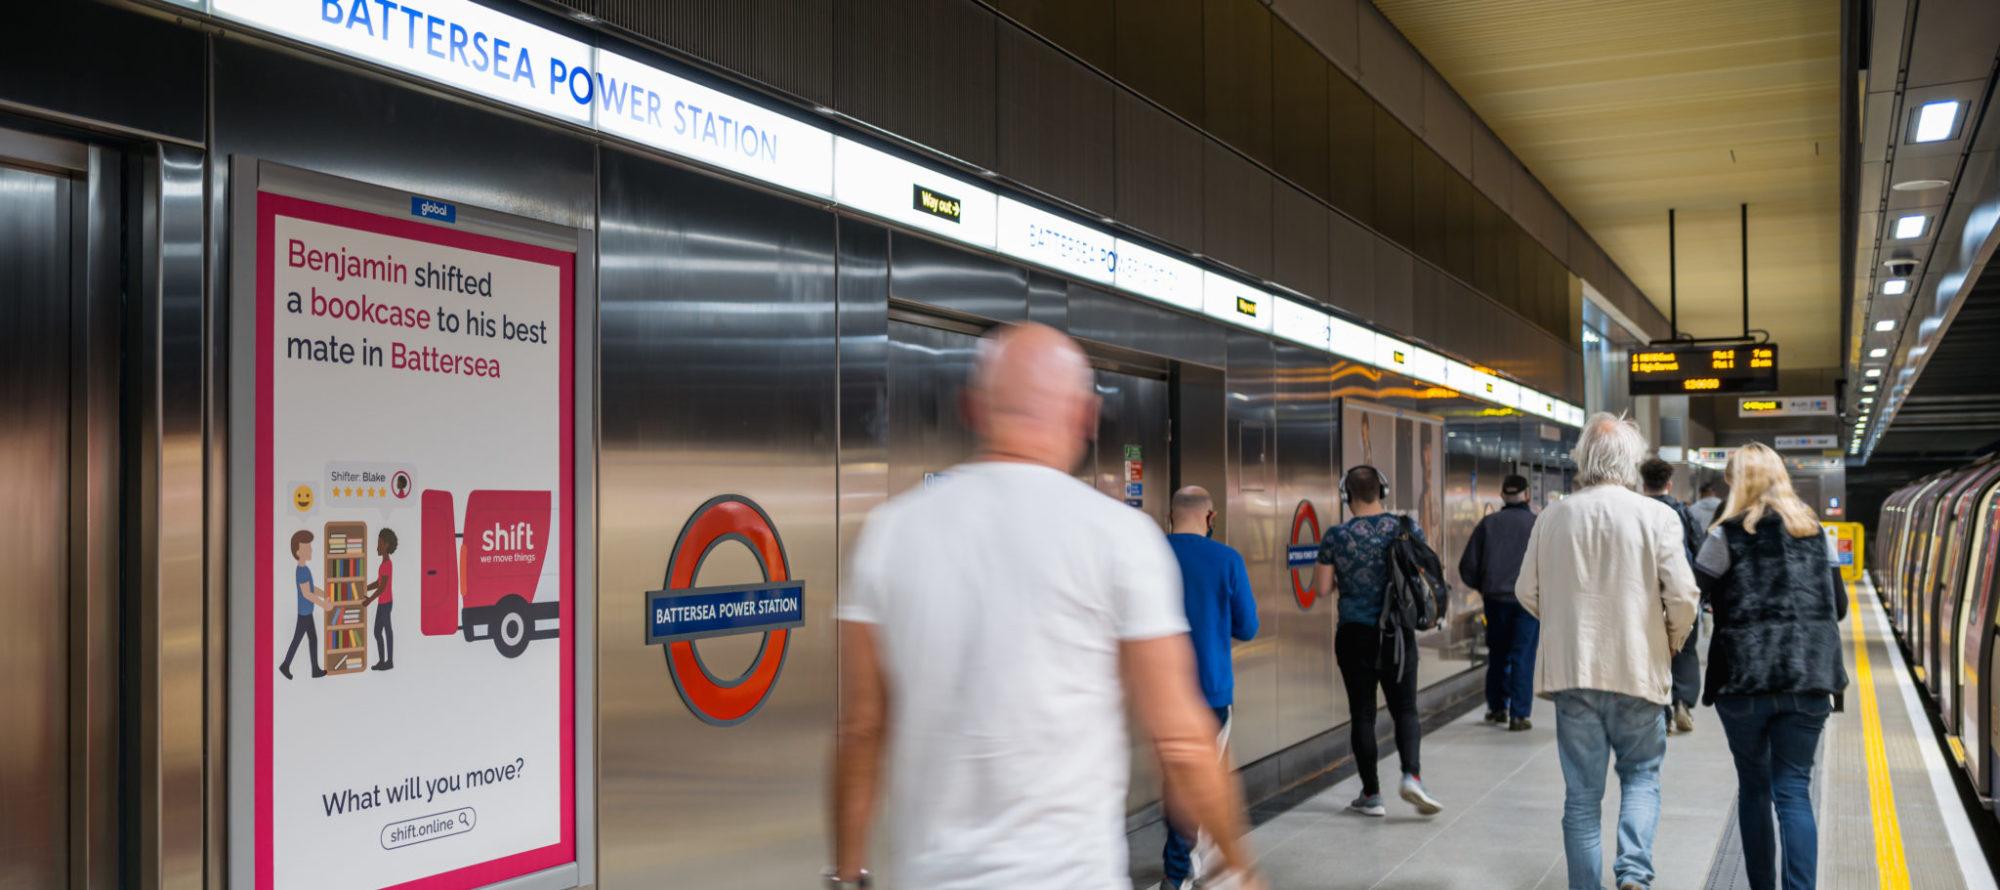 2021, Battersea Power Station, London, London Underground, Rail - Global